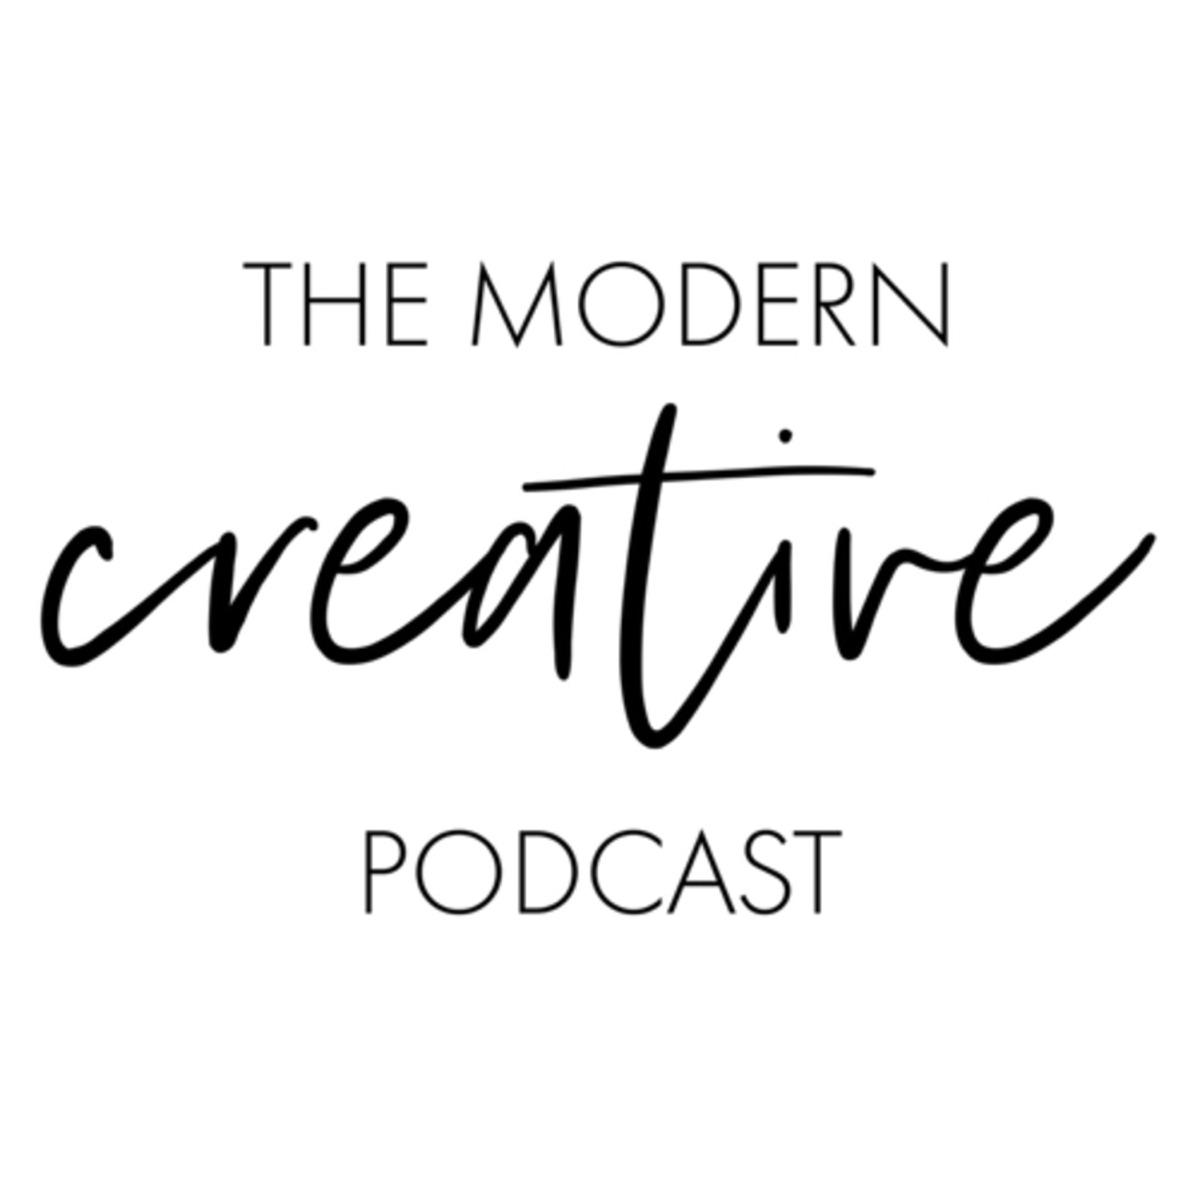 The Modern Creative